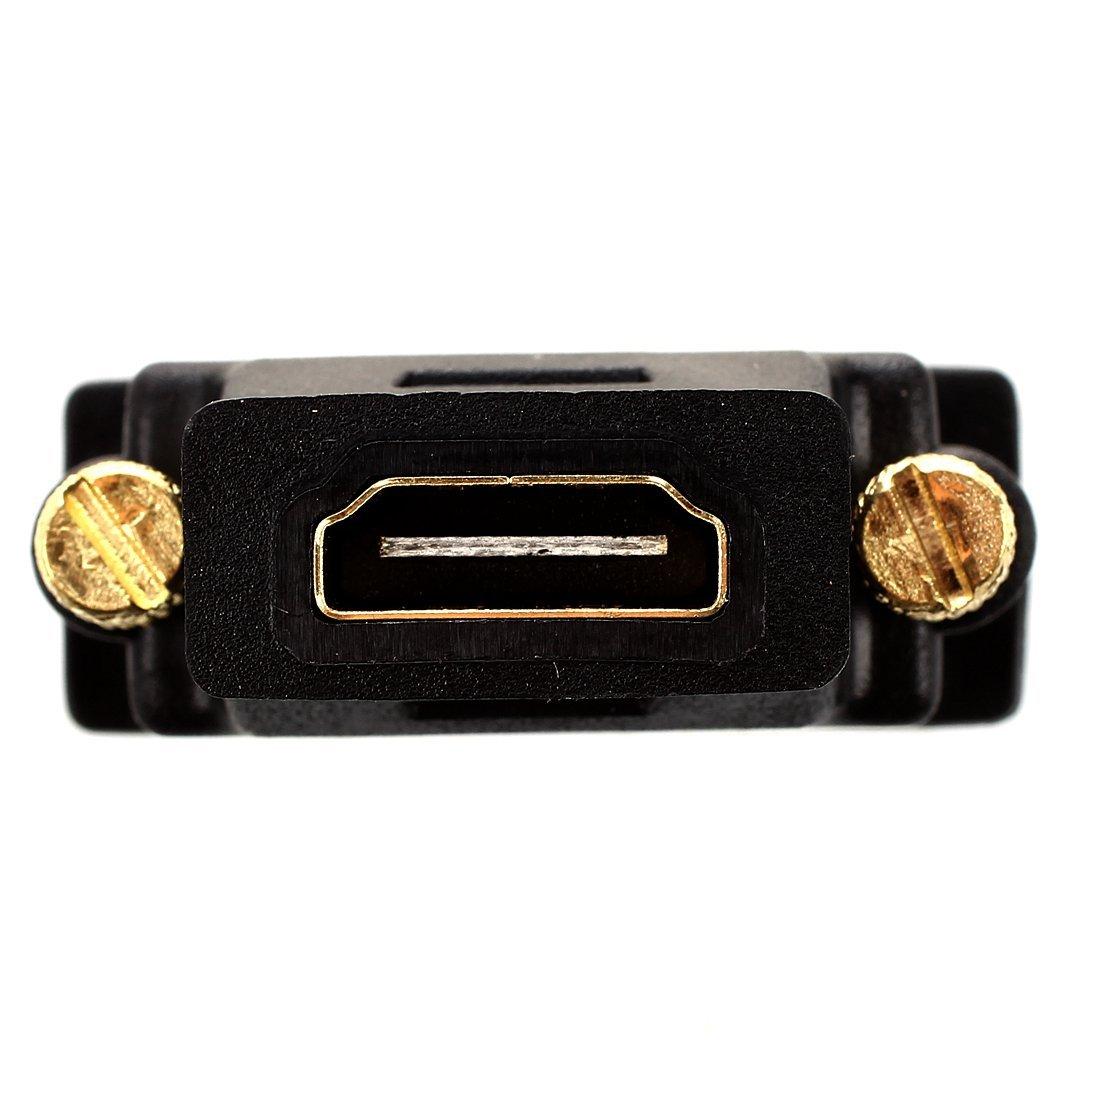 R TOOGOO DVI to HDMI conversion adapter DVI to HDMI conversion adapter HDMI: Female DVI 24 pin: male